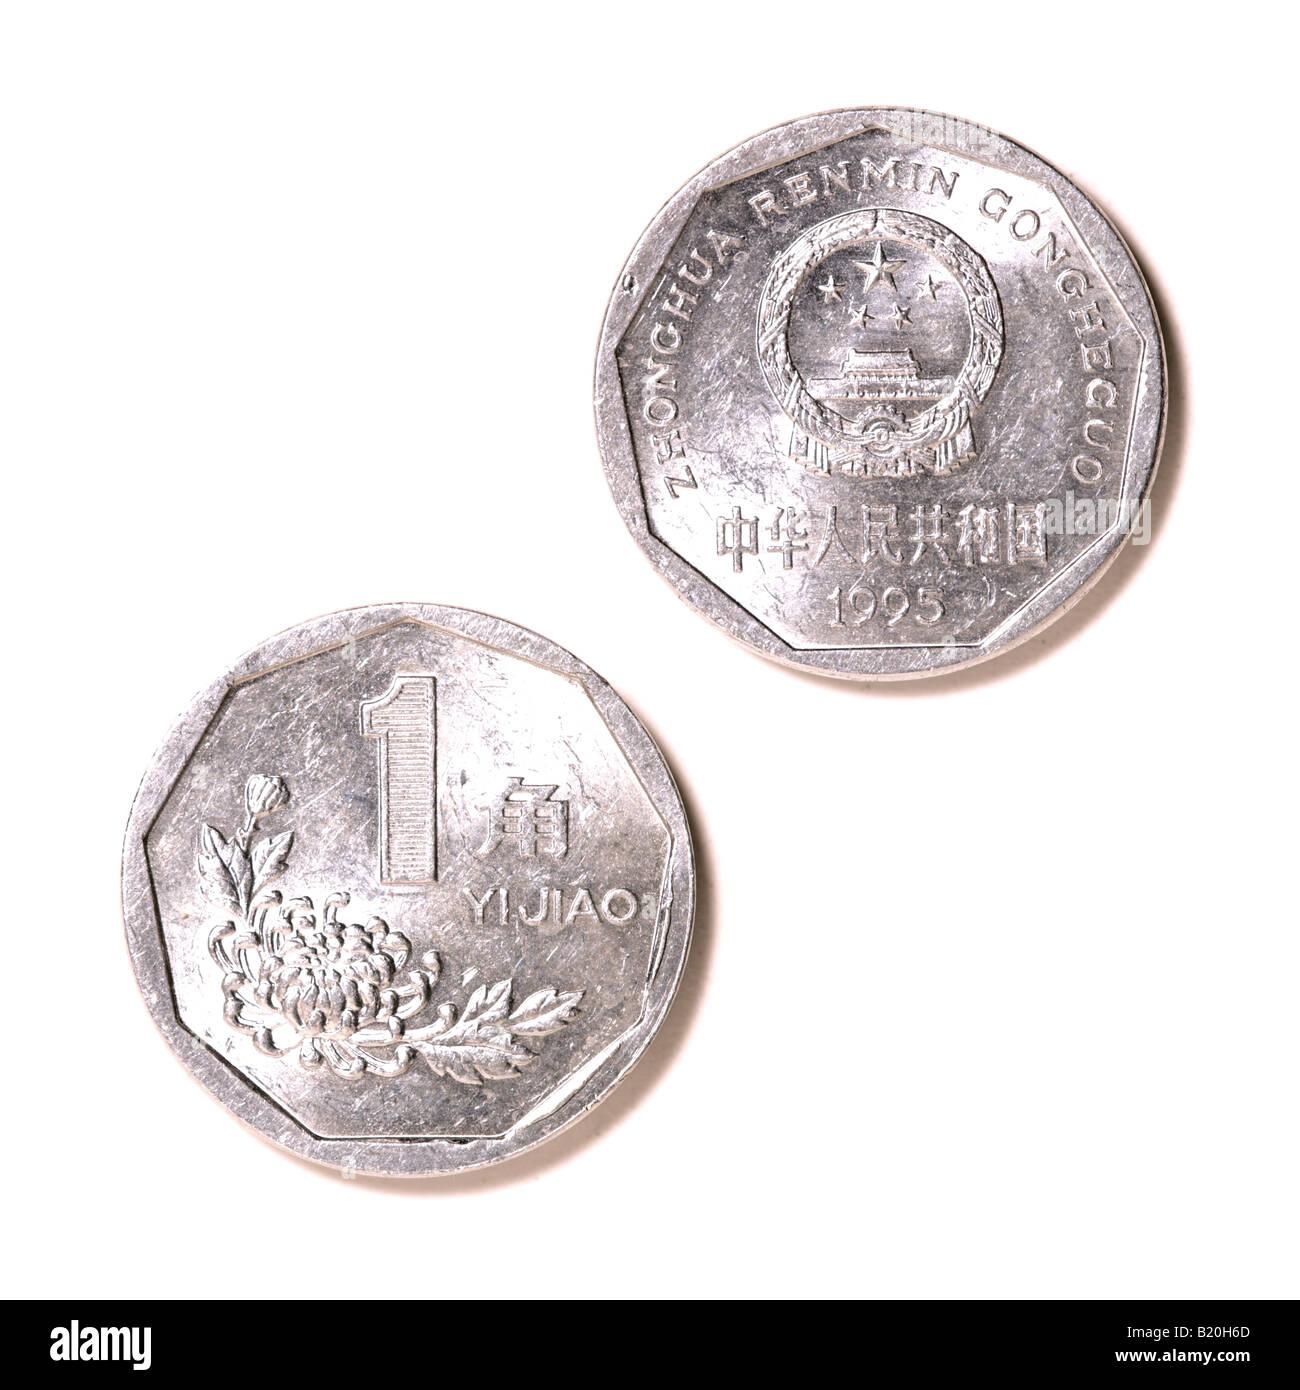 Chinesische Ein Jiao Münze Stockfoto Bild 18453189 Alamy